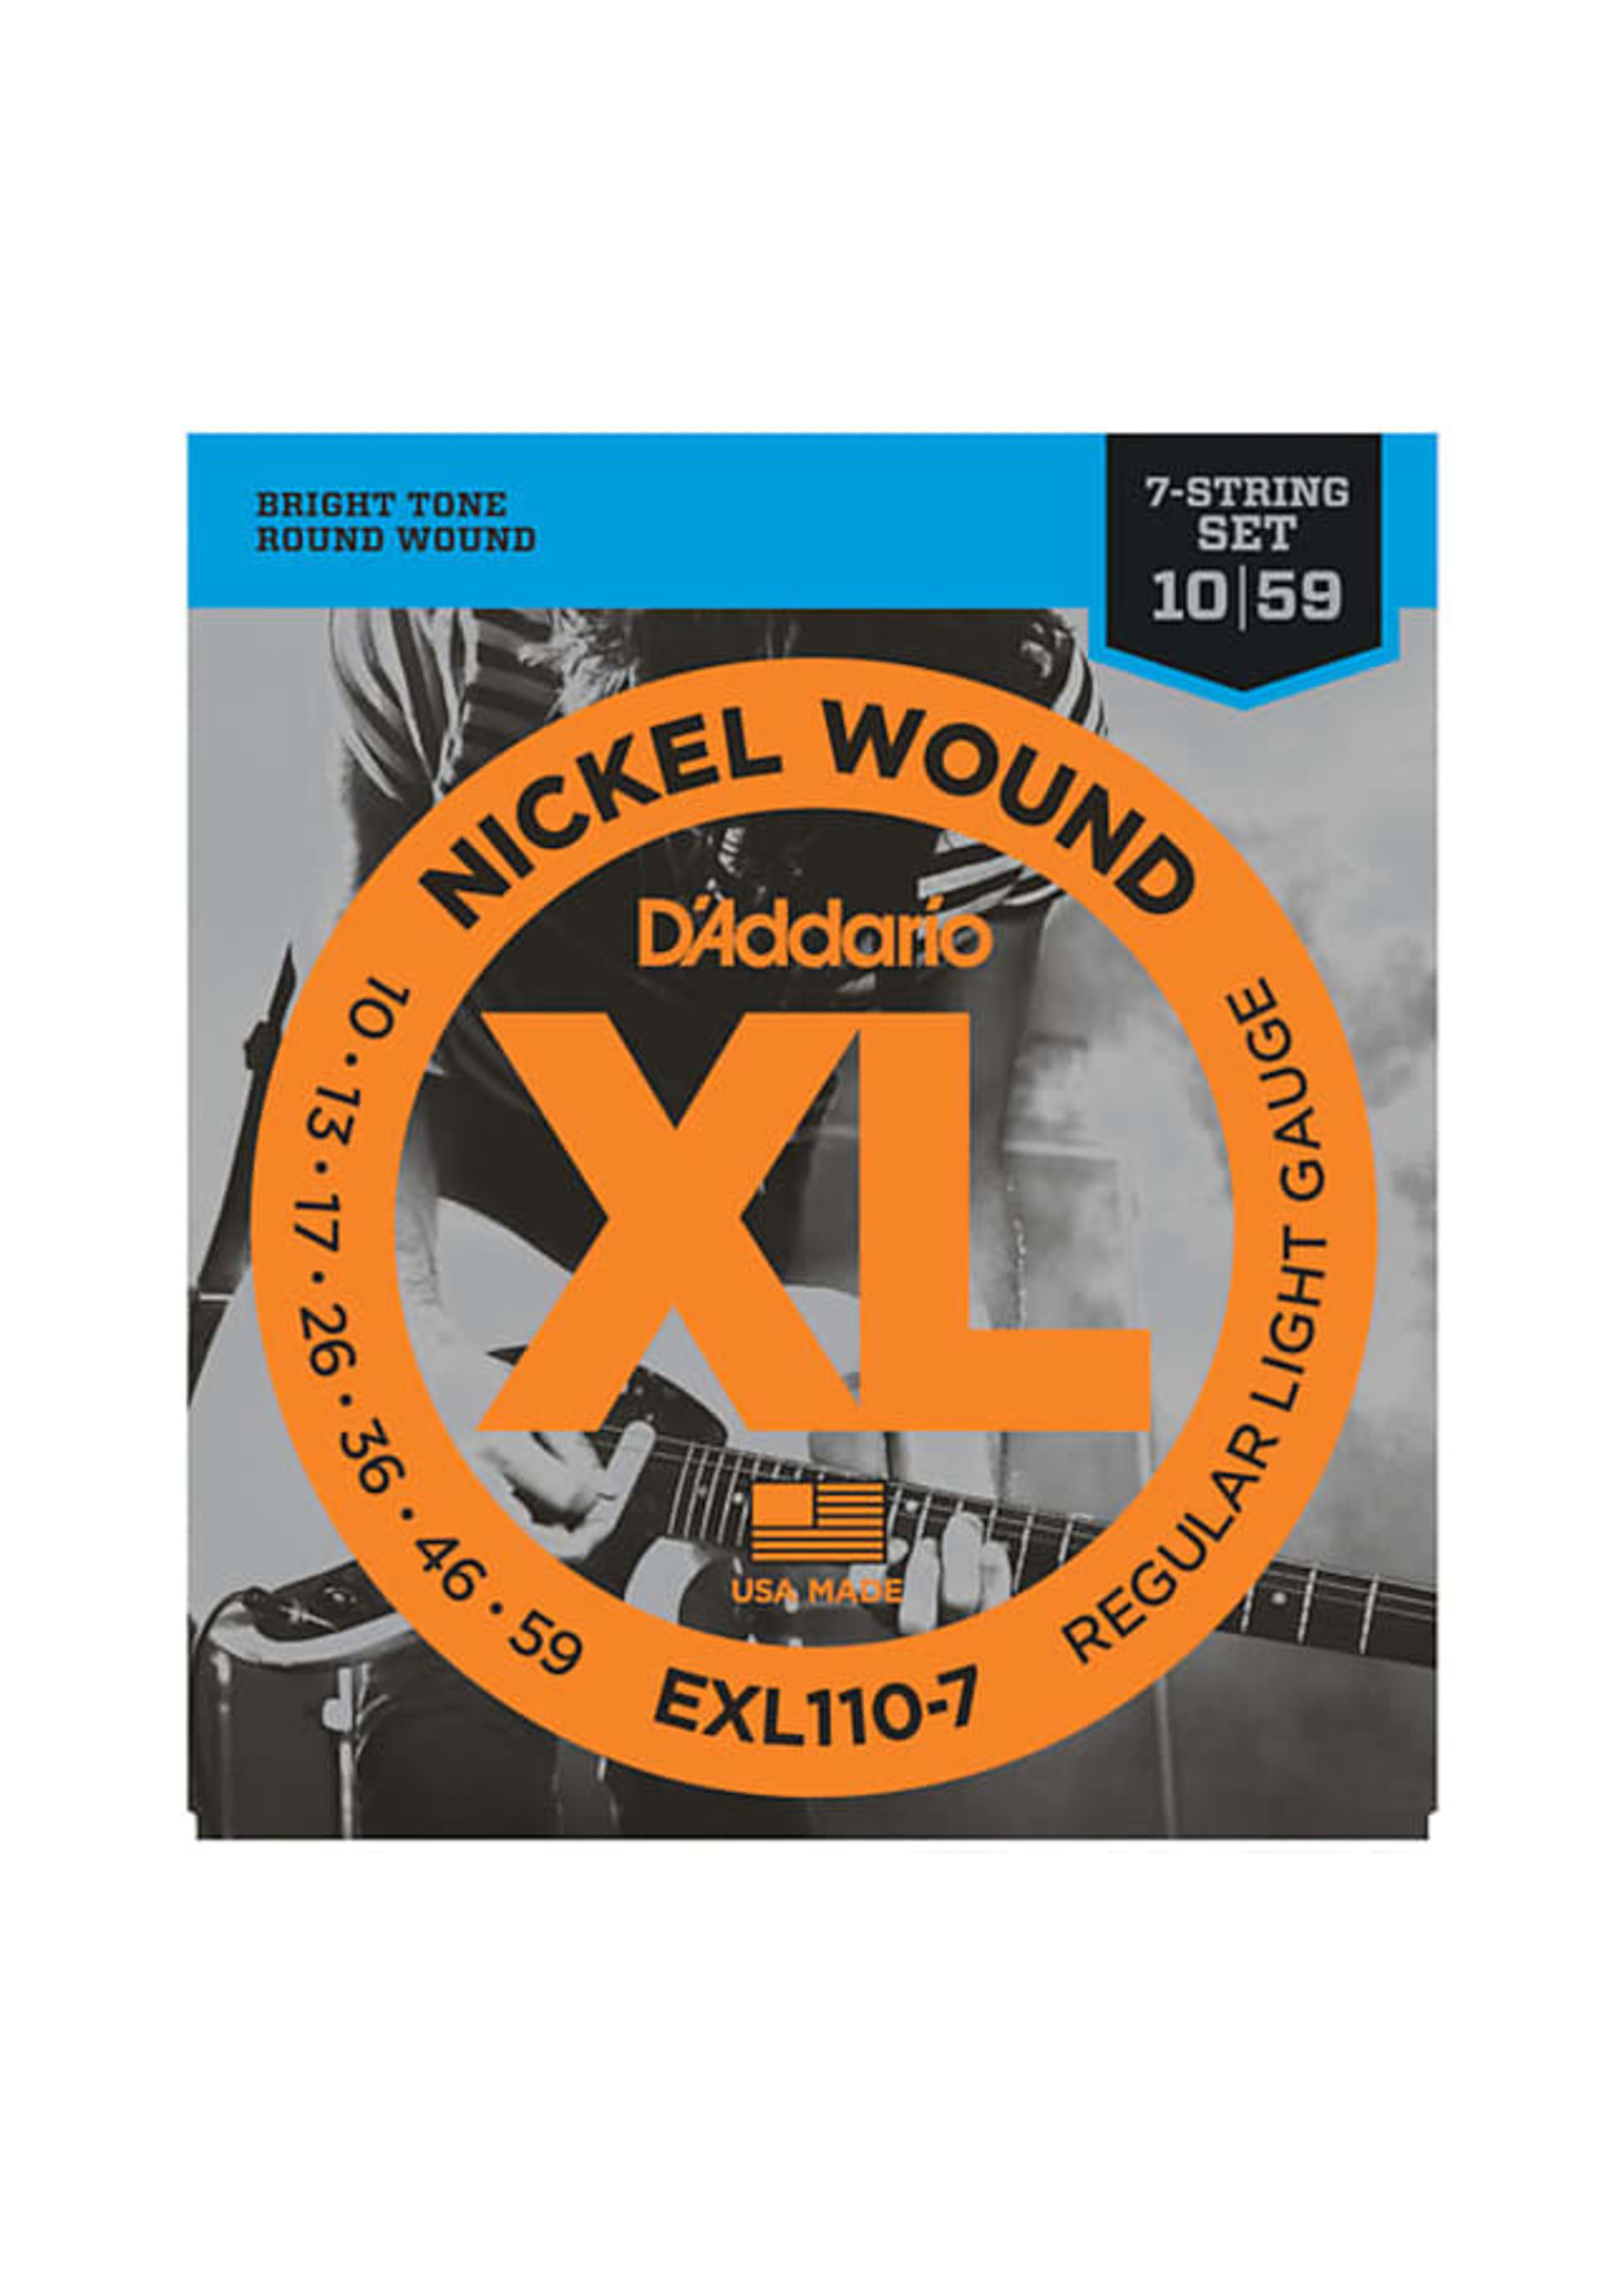 D'Addario D'Addario exl110-7 10-59 7 String Electric Guitar Set